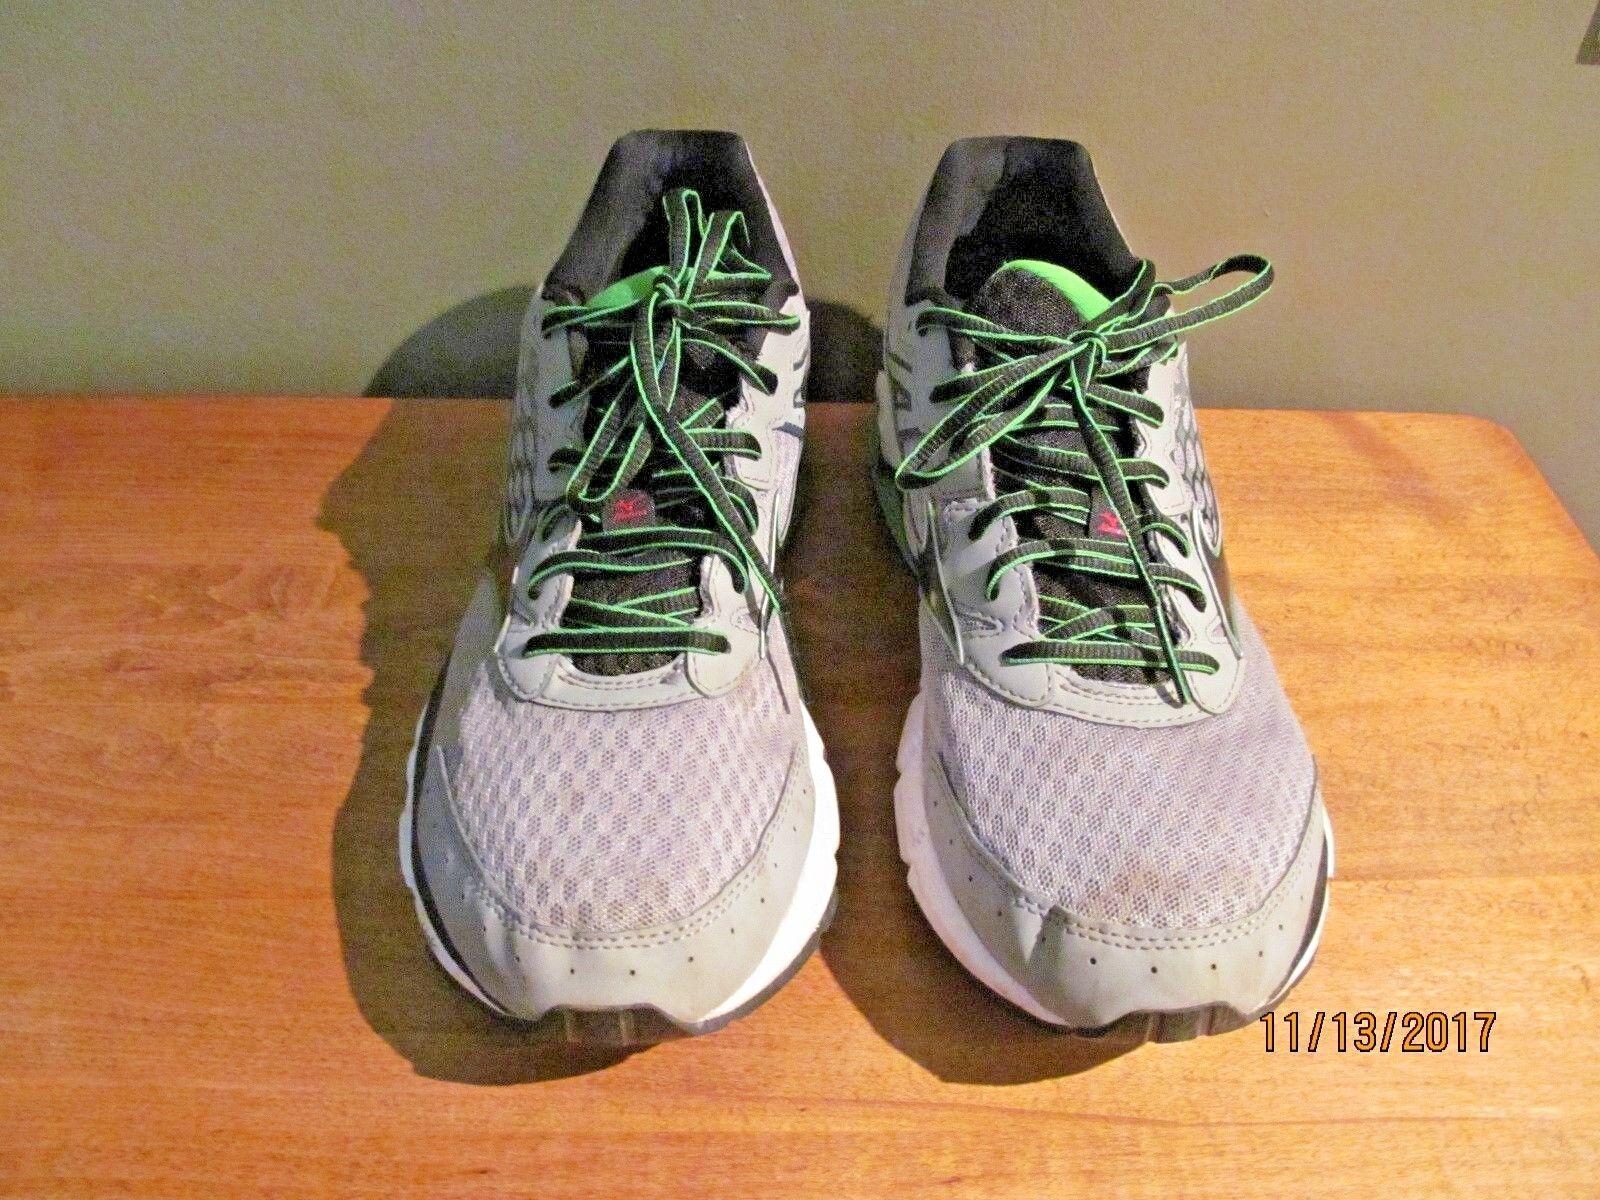 Mizuno SR Touch Wave Inspire Men's Running shoes Sz 11